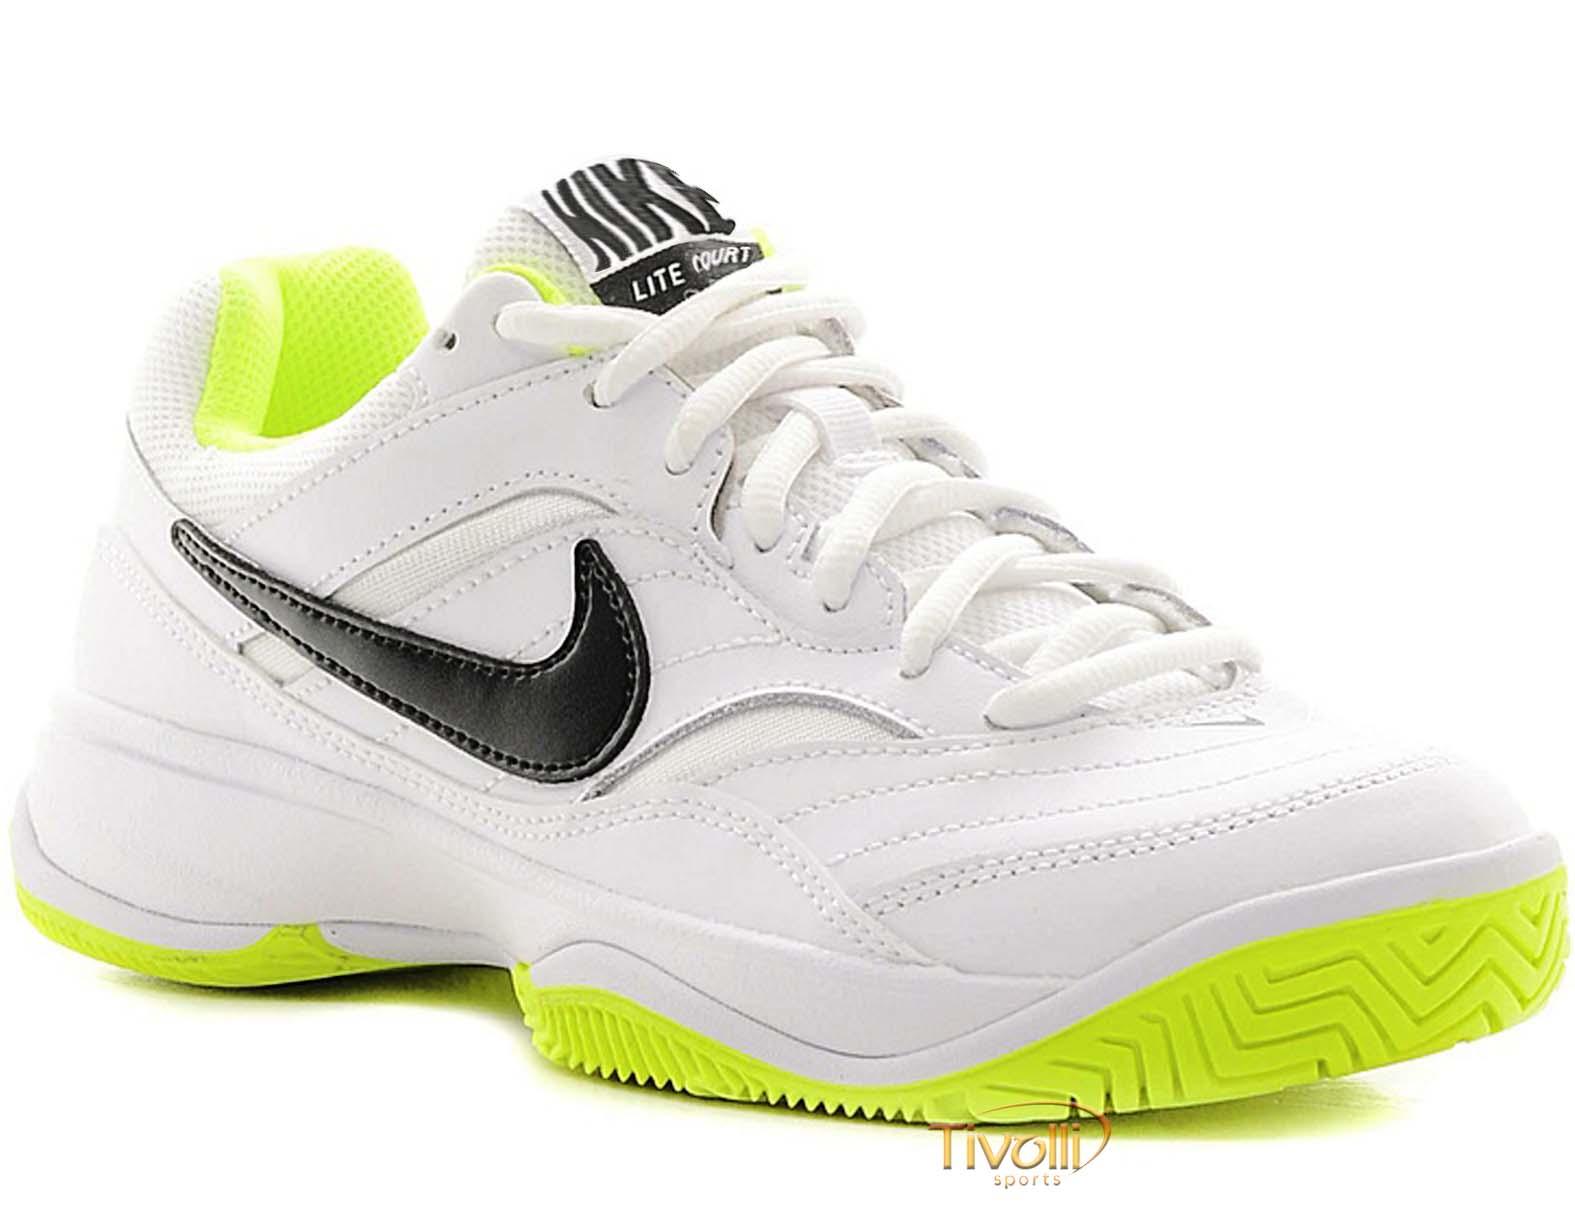 06766b36328 Raquete Mania   Tênis Nike   Court Lite Branco e Verde